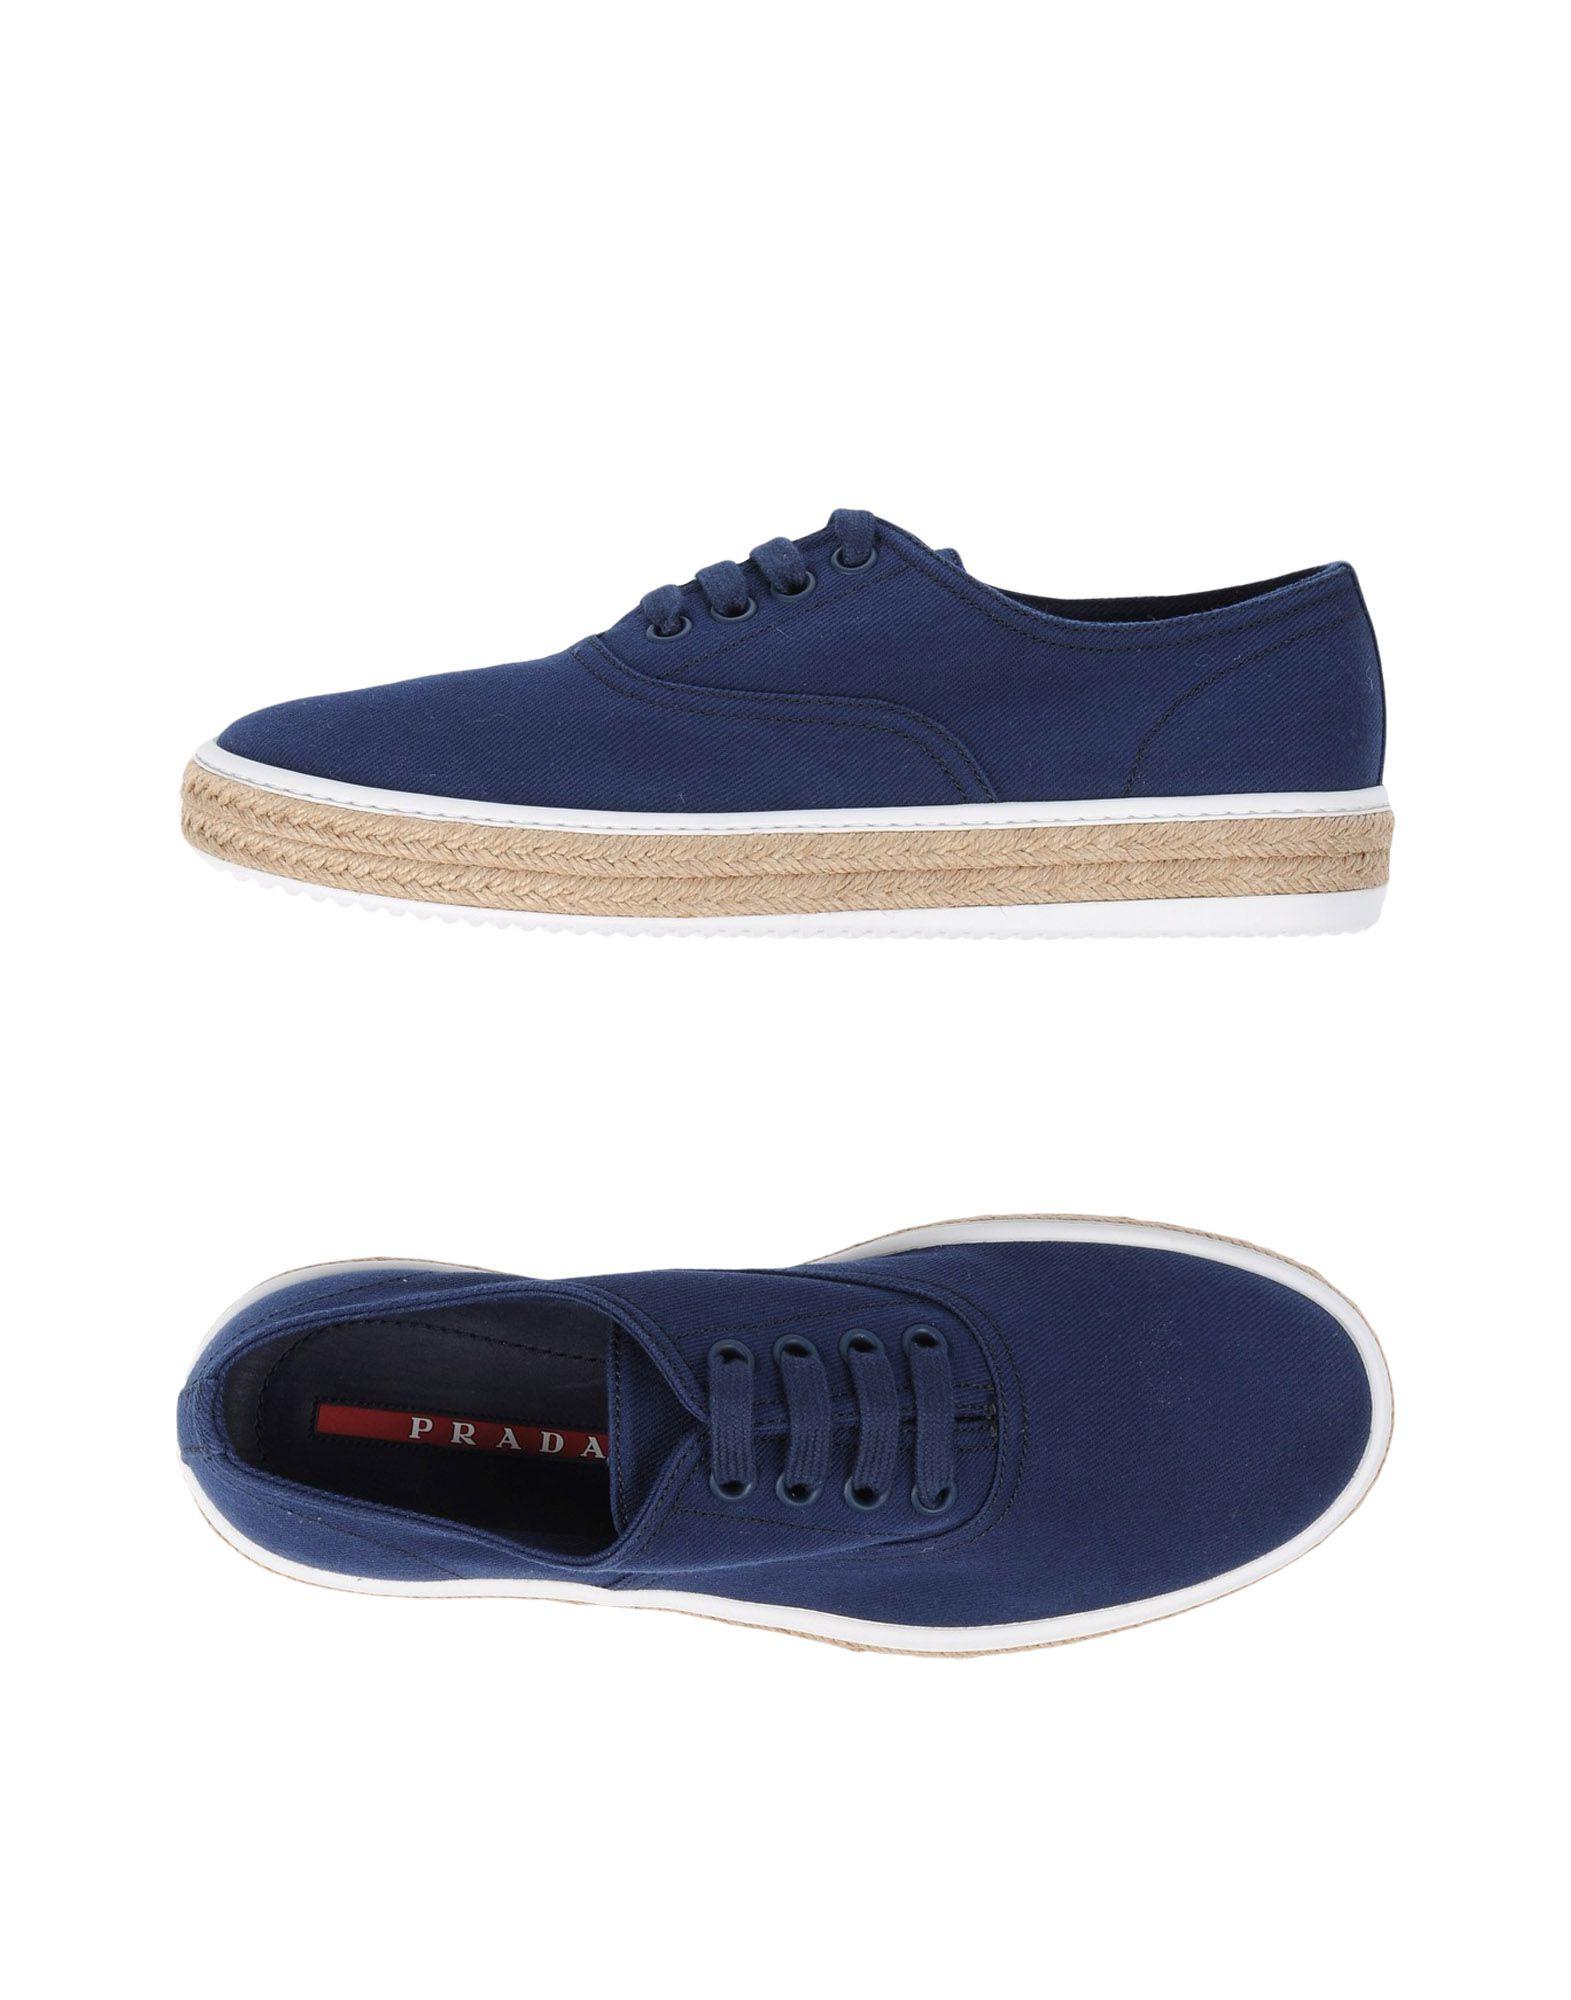 Prada Sport Sneakers Herren  11272472MW Gute Qualität beliebte Schuhe